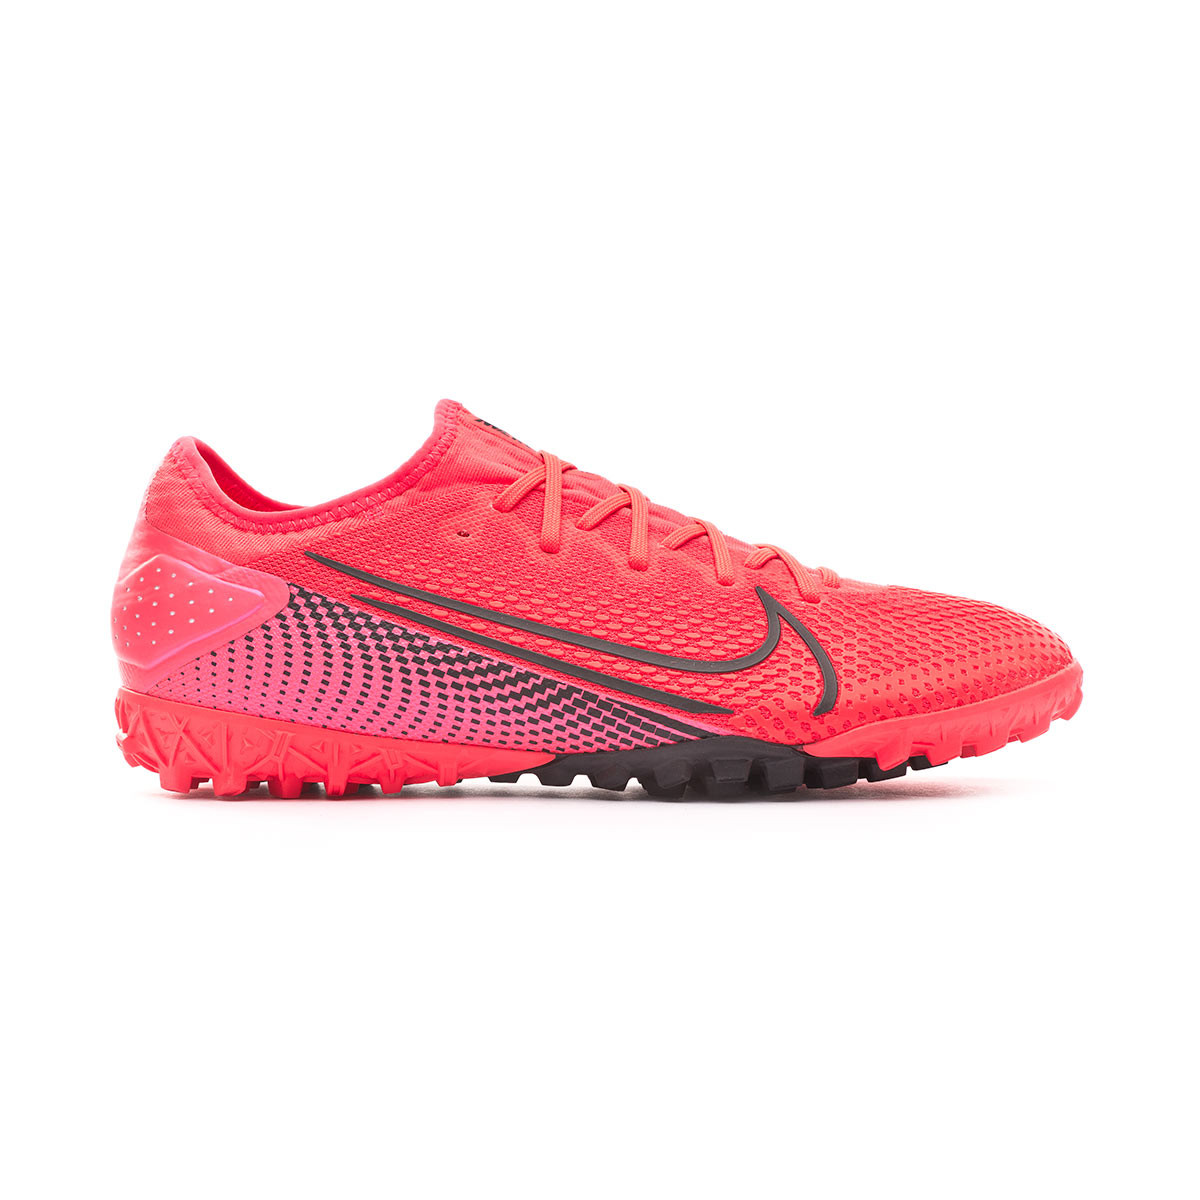 Chaussure de football Nike Mercurial Vapor XIII Pro Turf